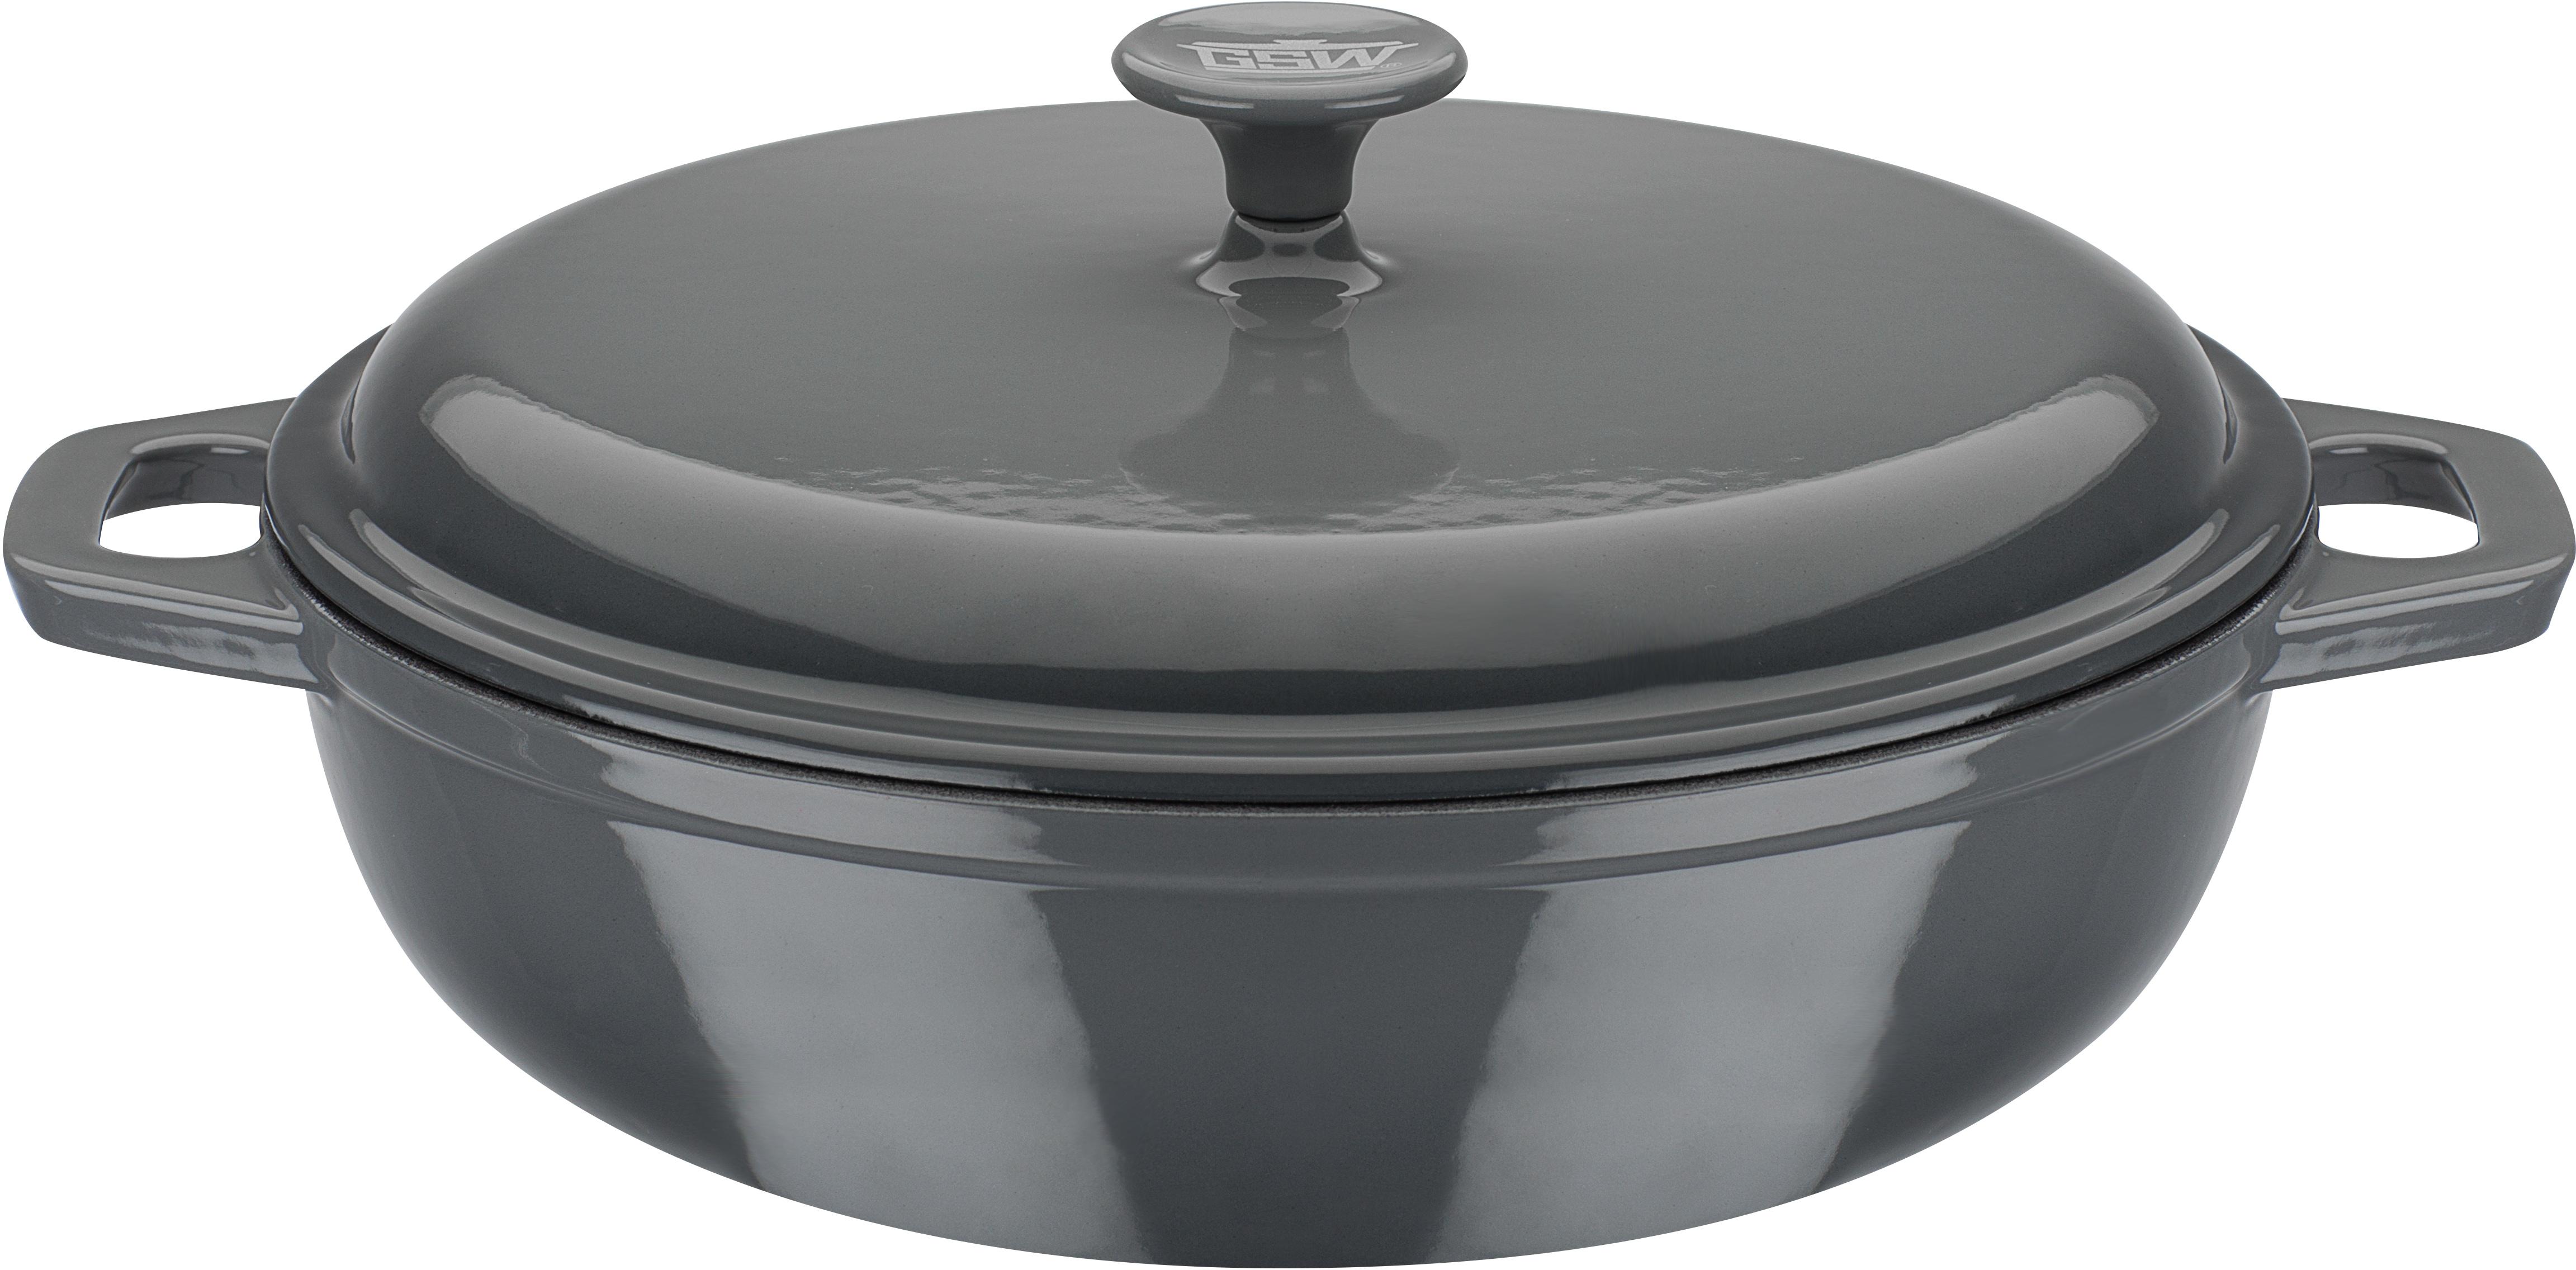 GSW Schmortopf grey, Gusseisen, (1 tlg.), Induktion grau Schmortöpfe Töpfe Haushaltswaren